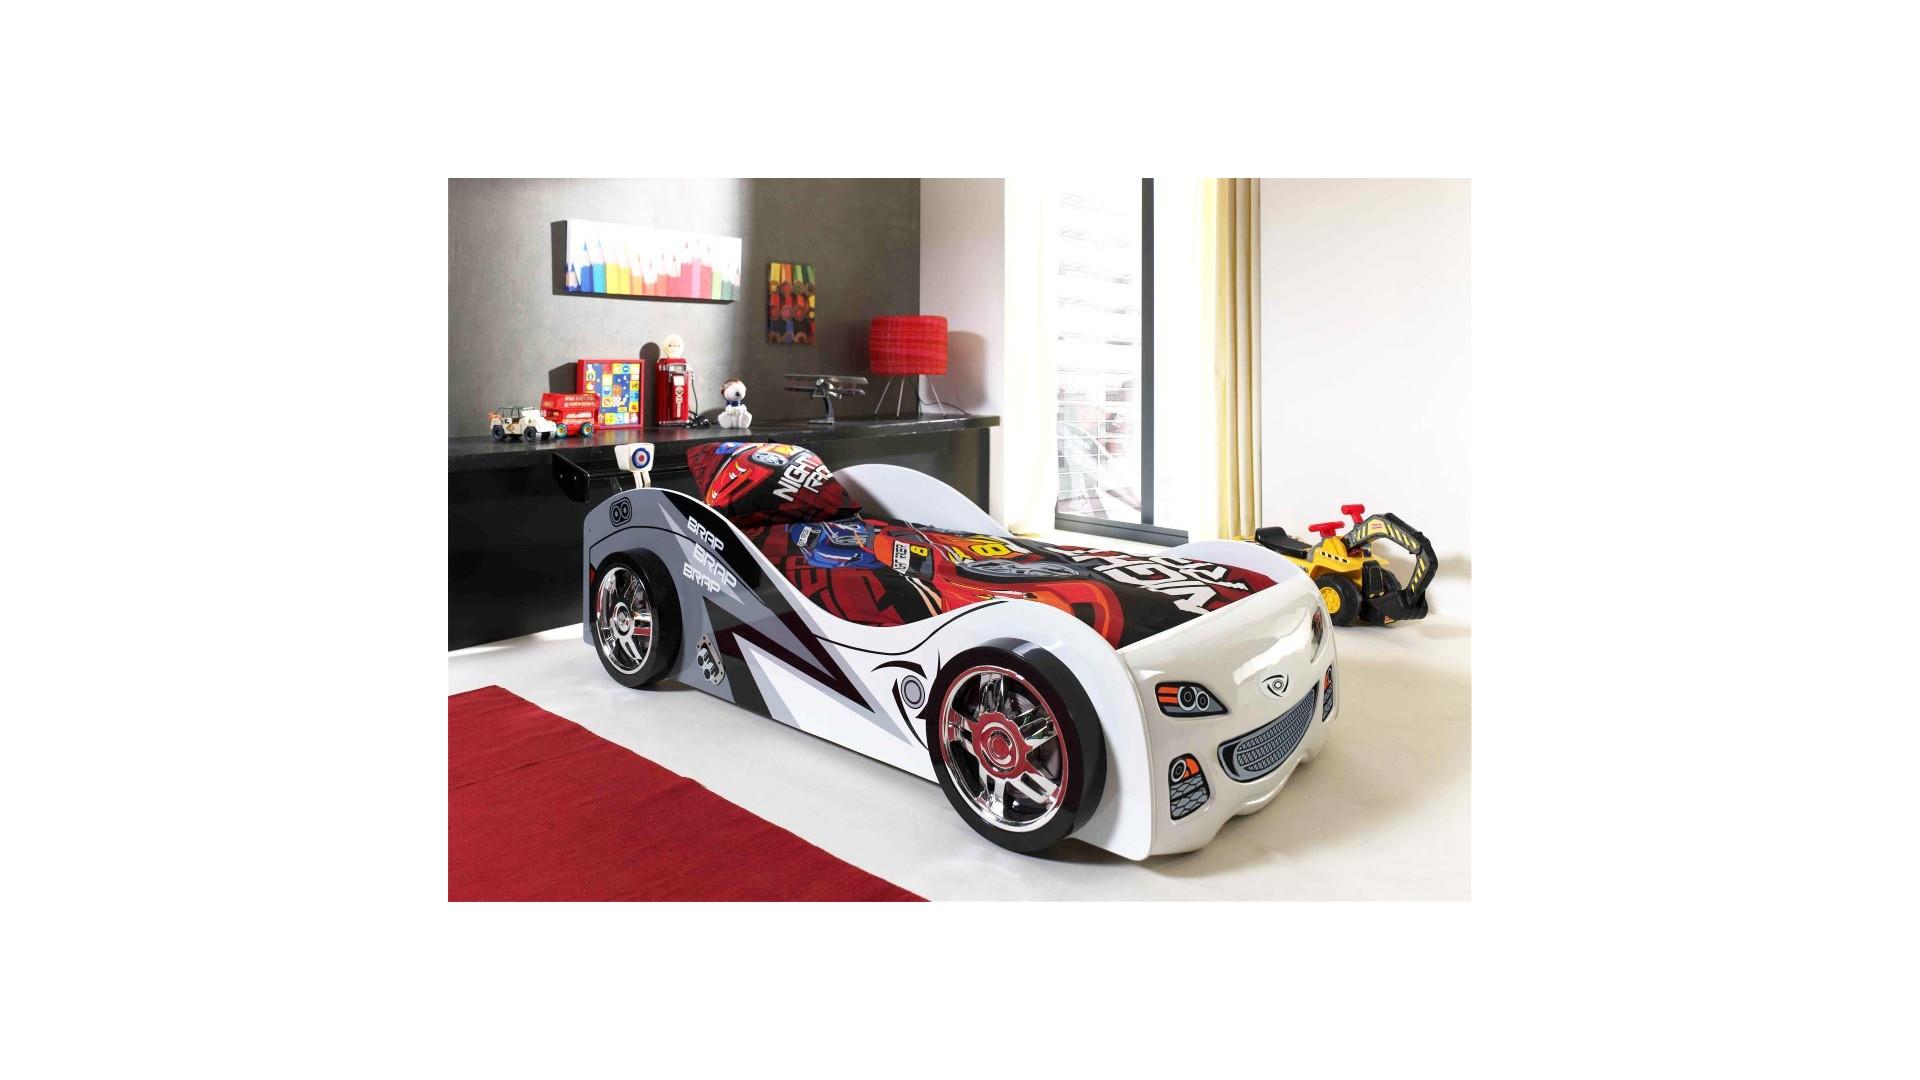 Lit  garçon voiture Smily blanc couchage 90 x 200 cm - SONUIT